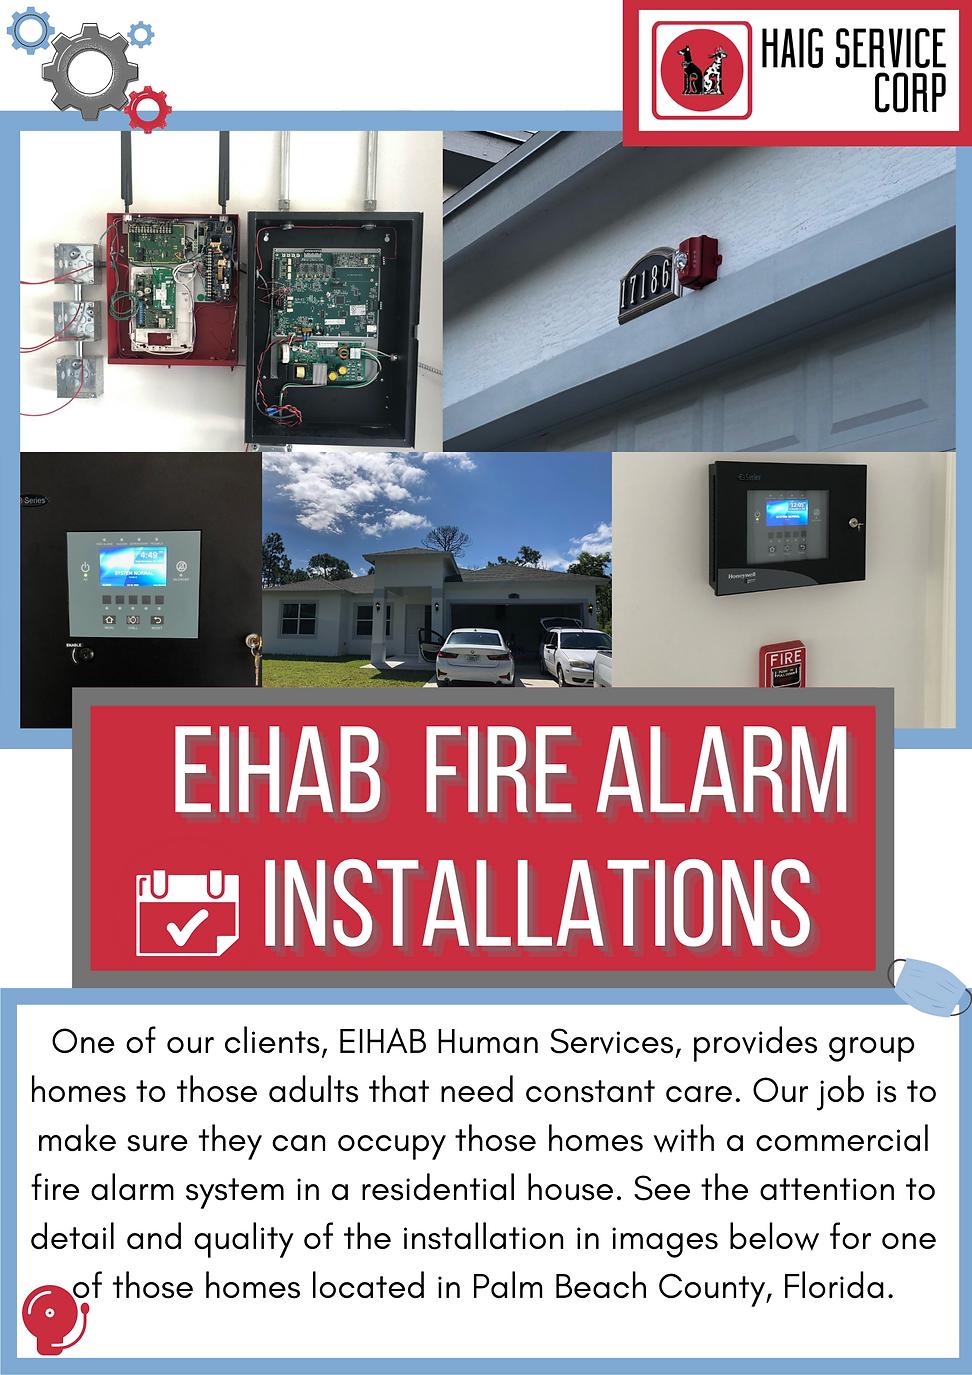 EIHAB Fire Alarm-6.png